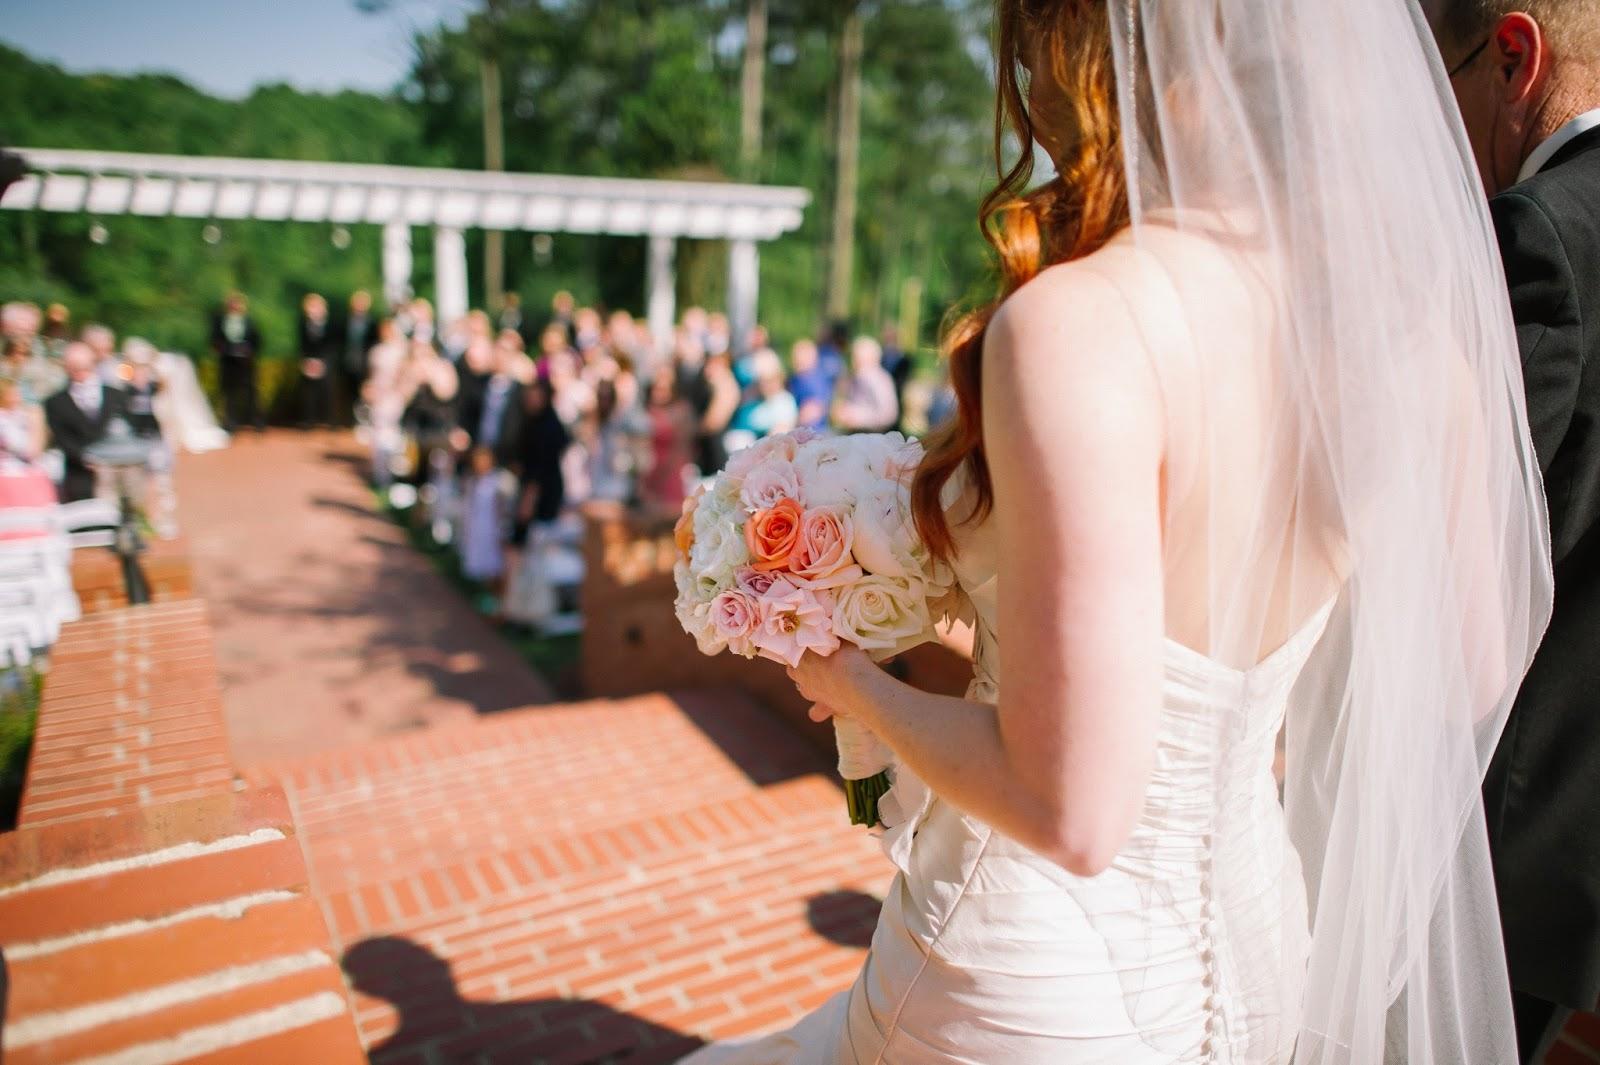 Wedding Ceremony Bridal Processional Songs Dj Wrex